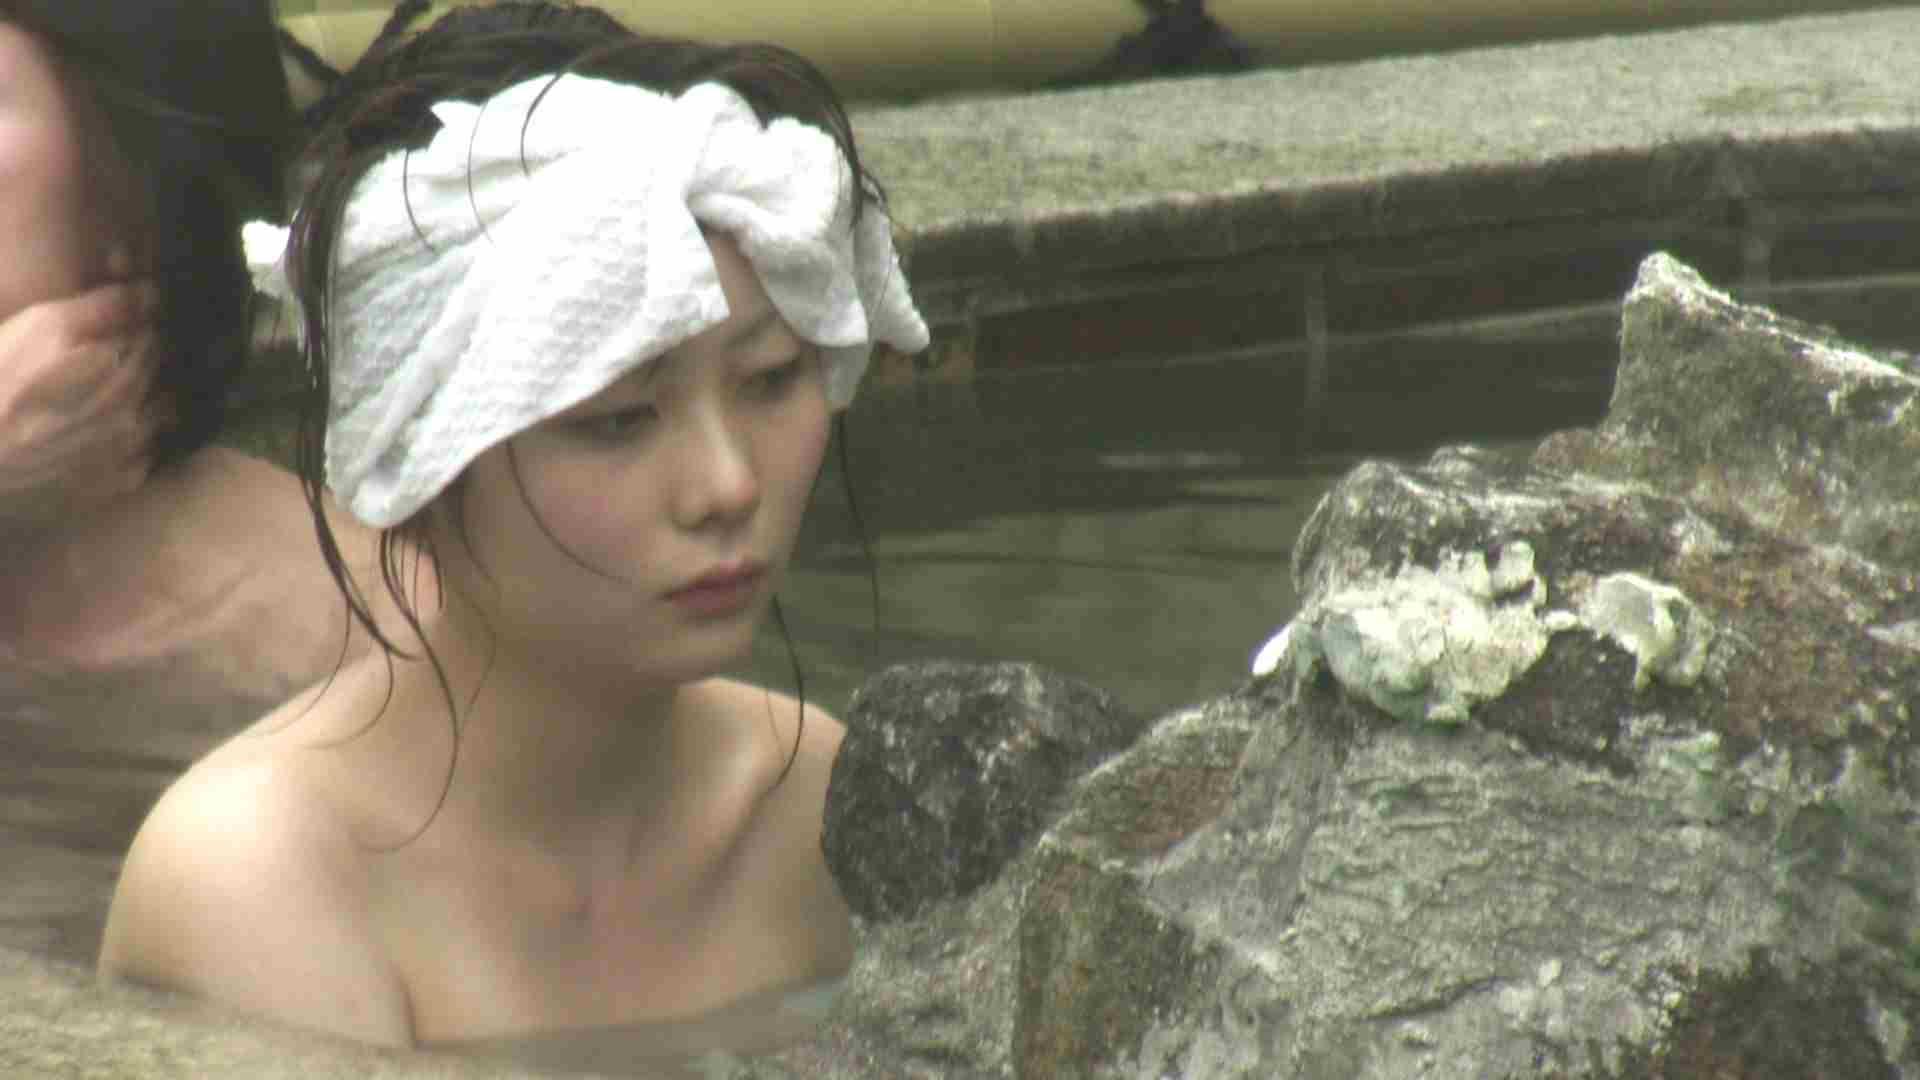 Aquaな露天風呂Vol.147 盗撮シリーズ | 露天風呂編  80PIX 19